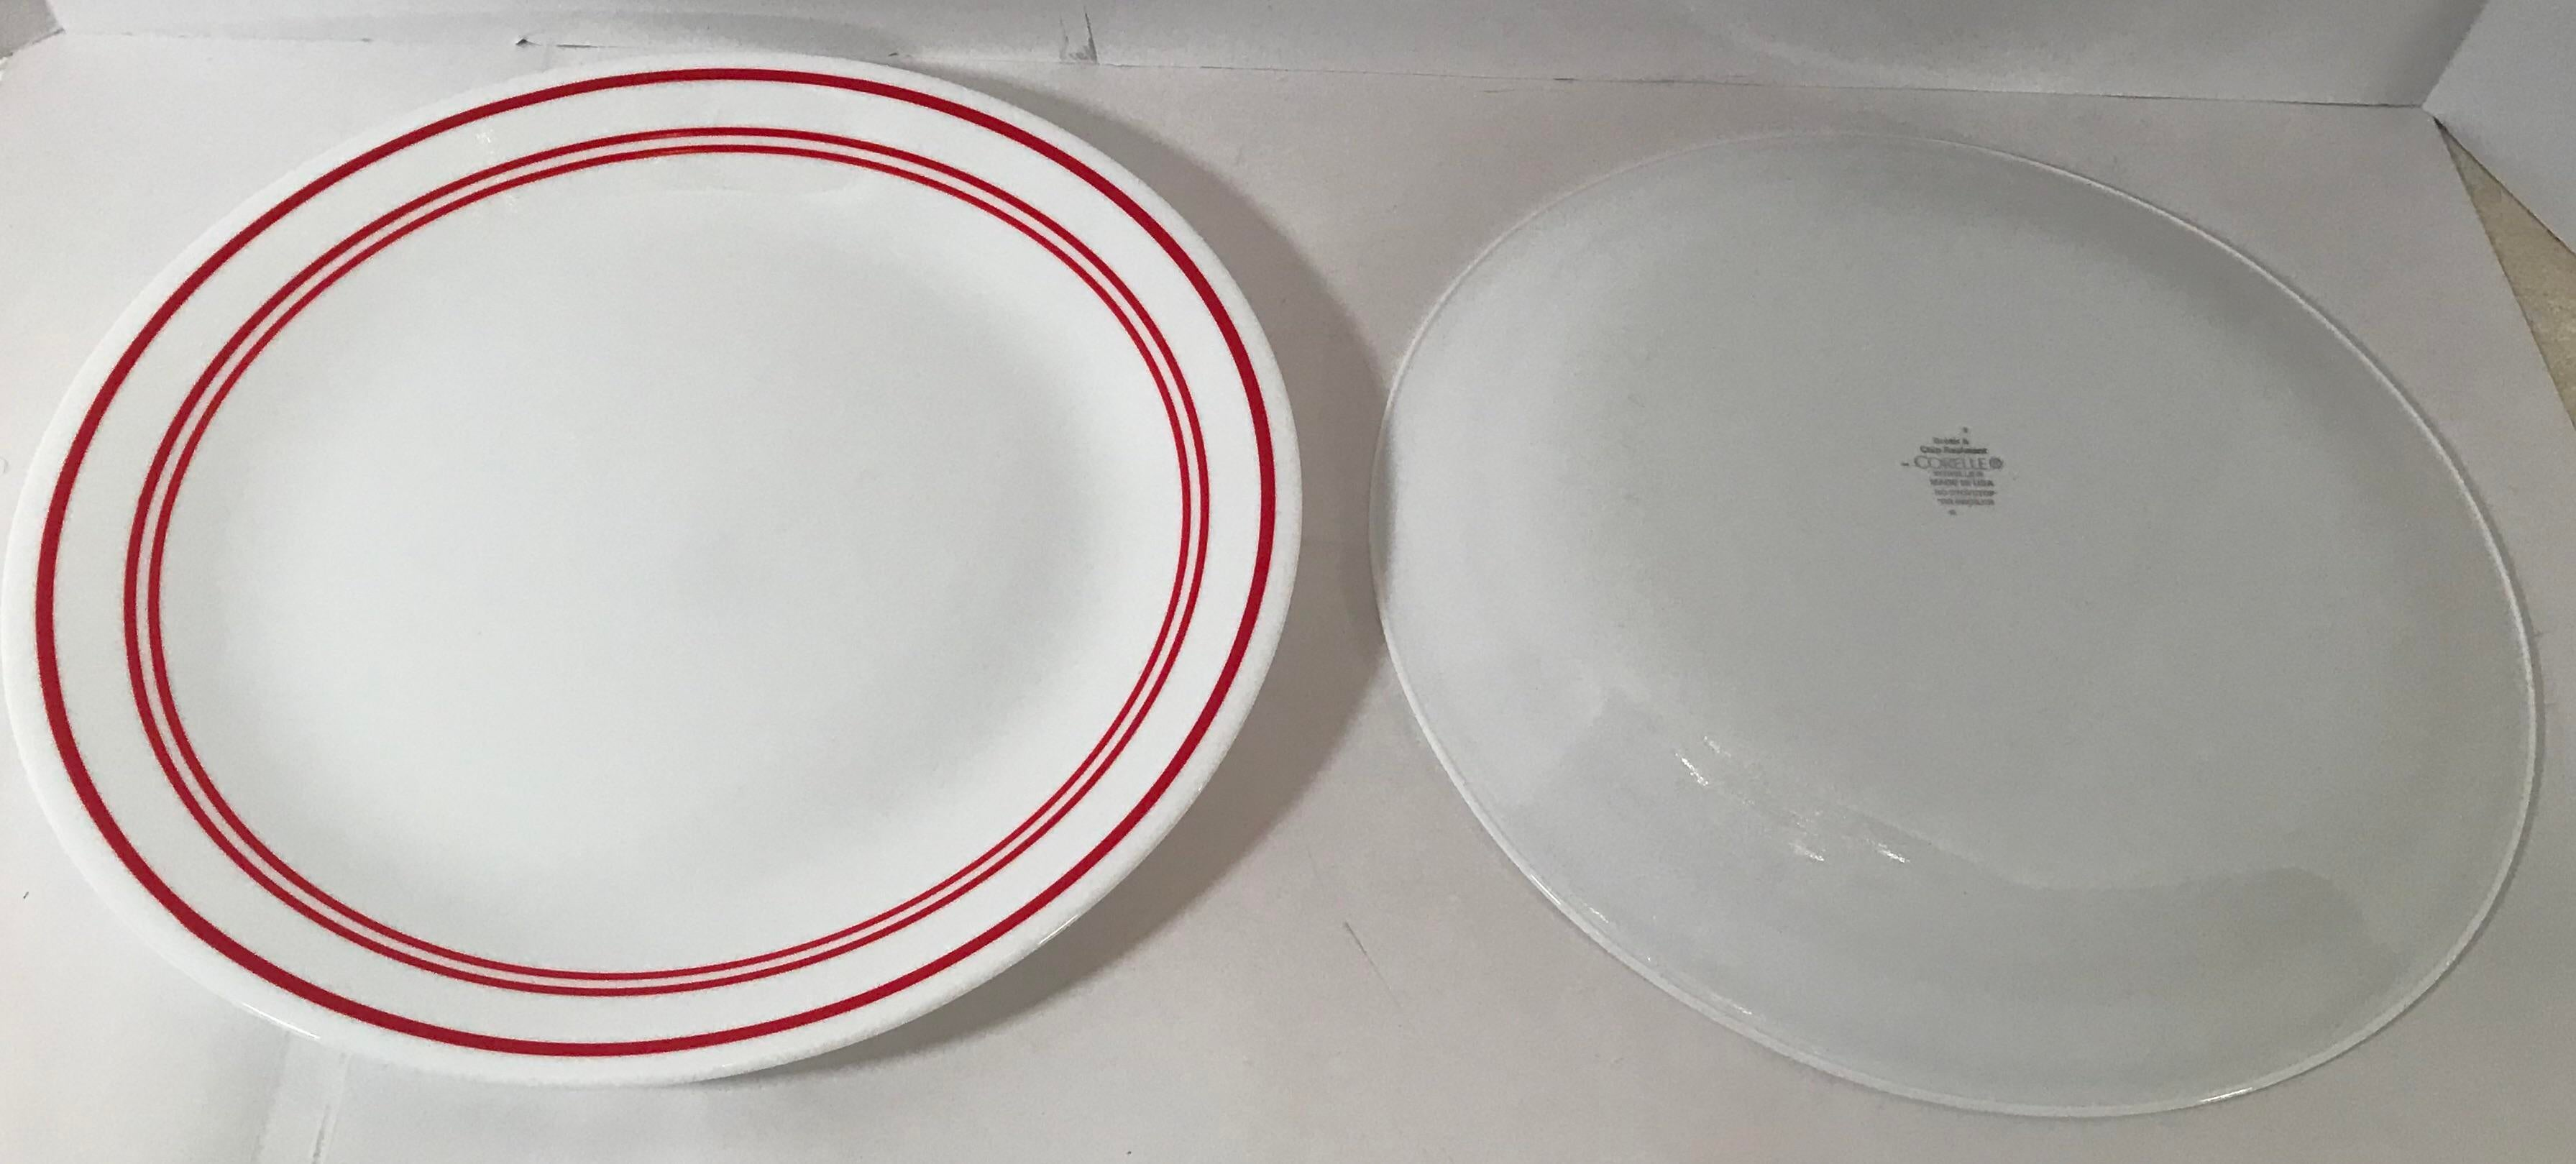 Vintage Red Stripe u0026 White Corelle Dinnerware -Set of 14 - Image 9 of 11  sc 1 st  Chairish & Vintage Red Stripe u0026 White Corelle Dinnerware -Set of 14   Chairish